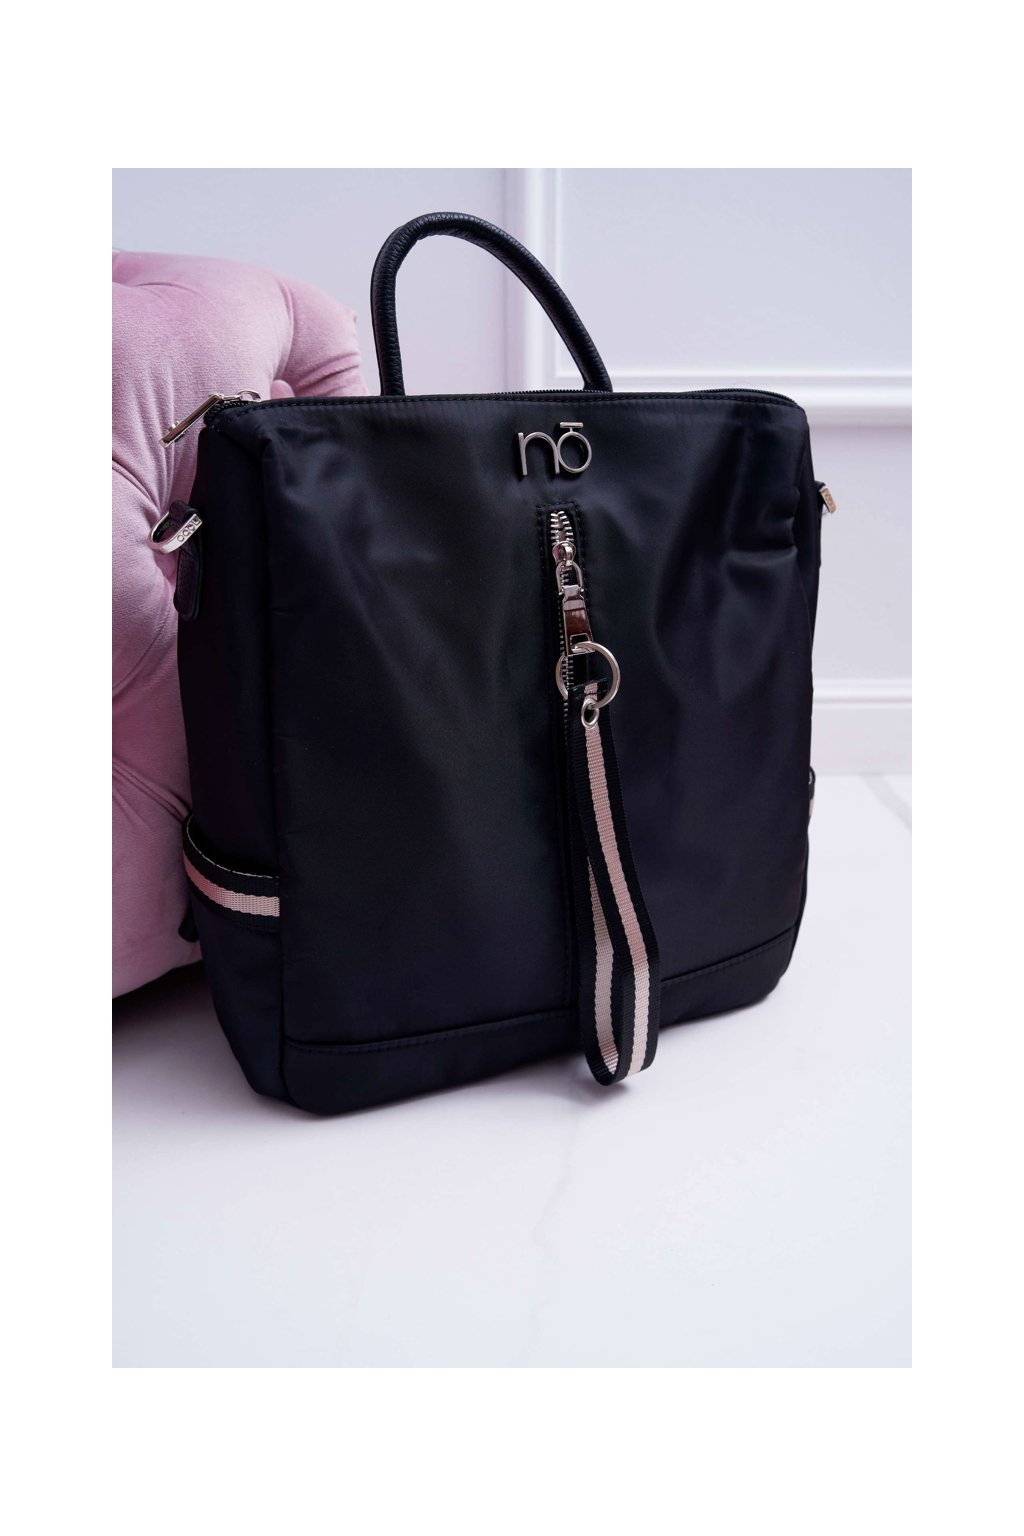 Klasický dámsky čierny batoh NBAG-H0880-C020